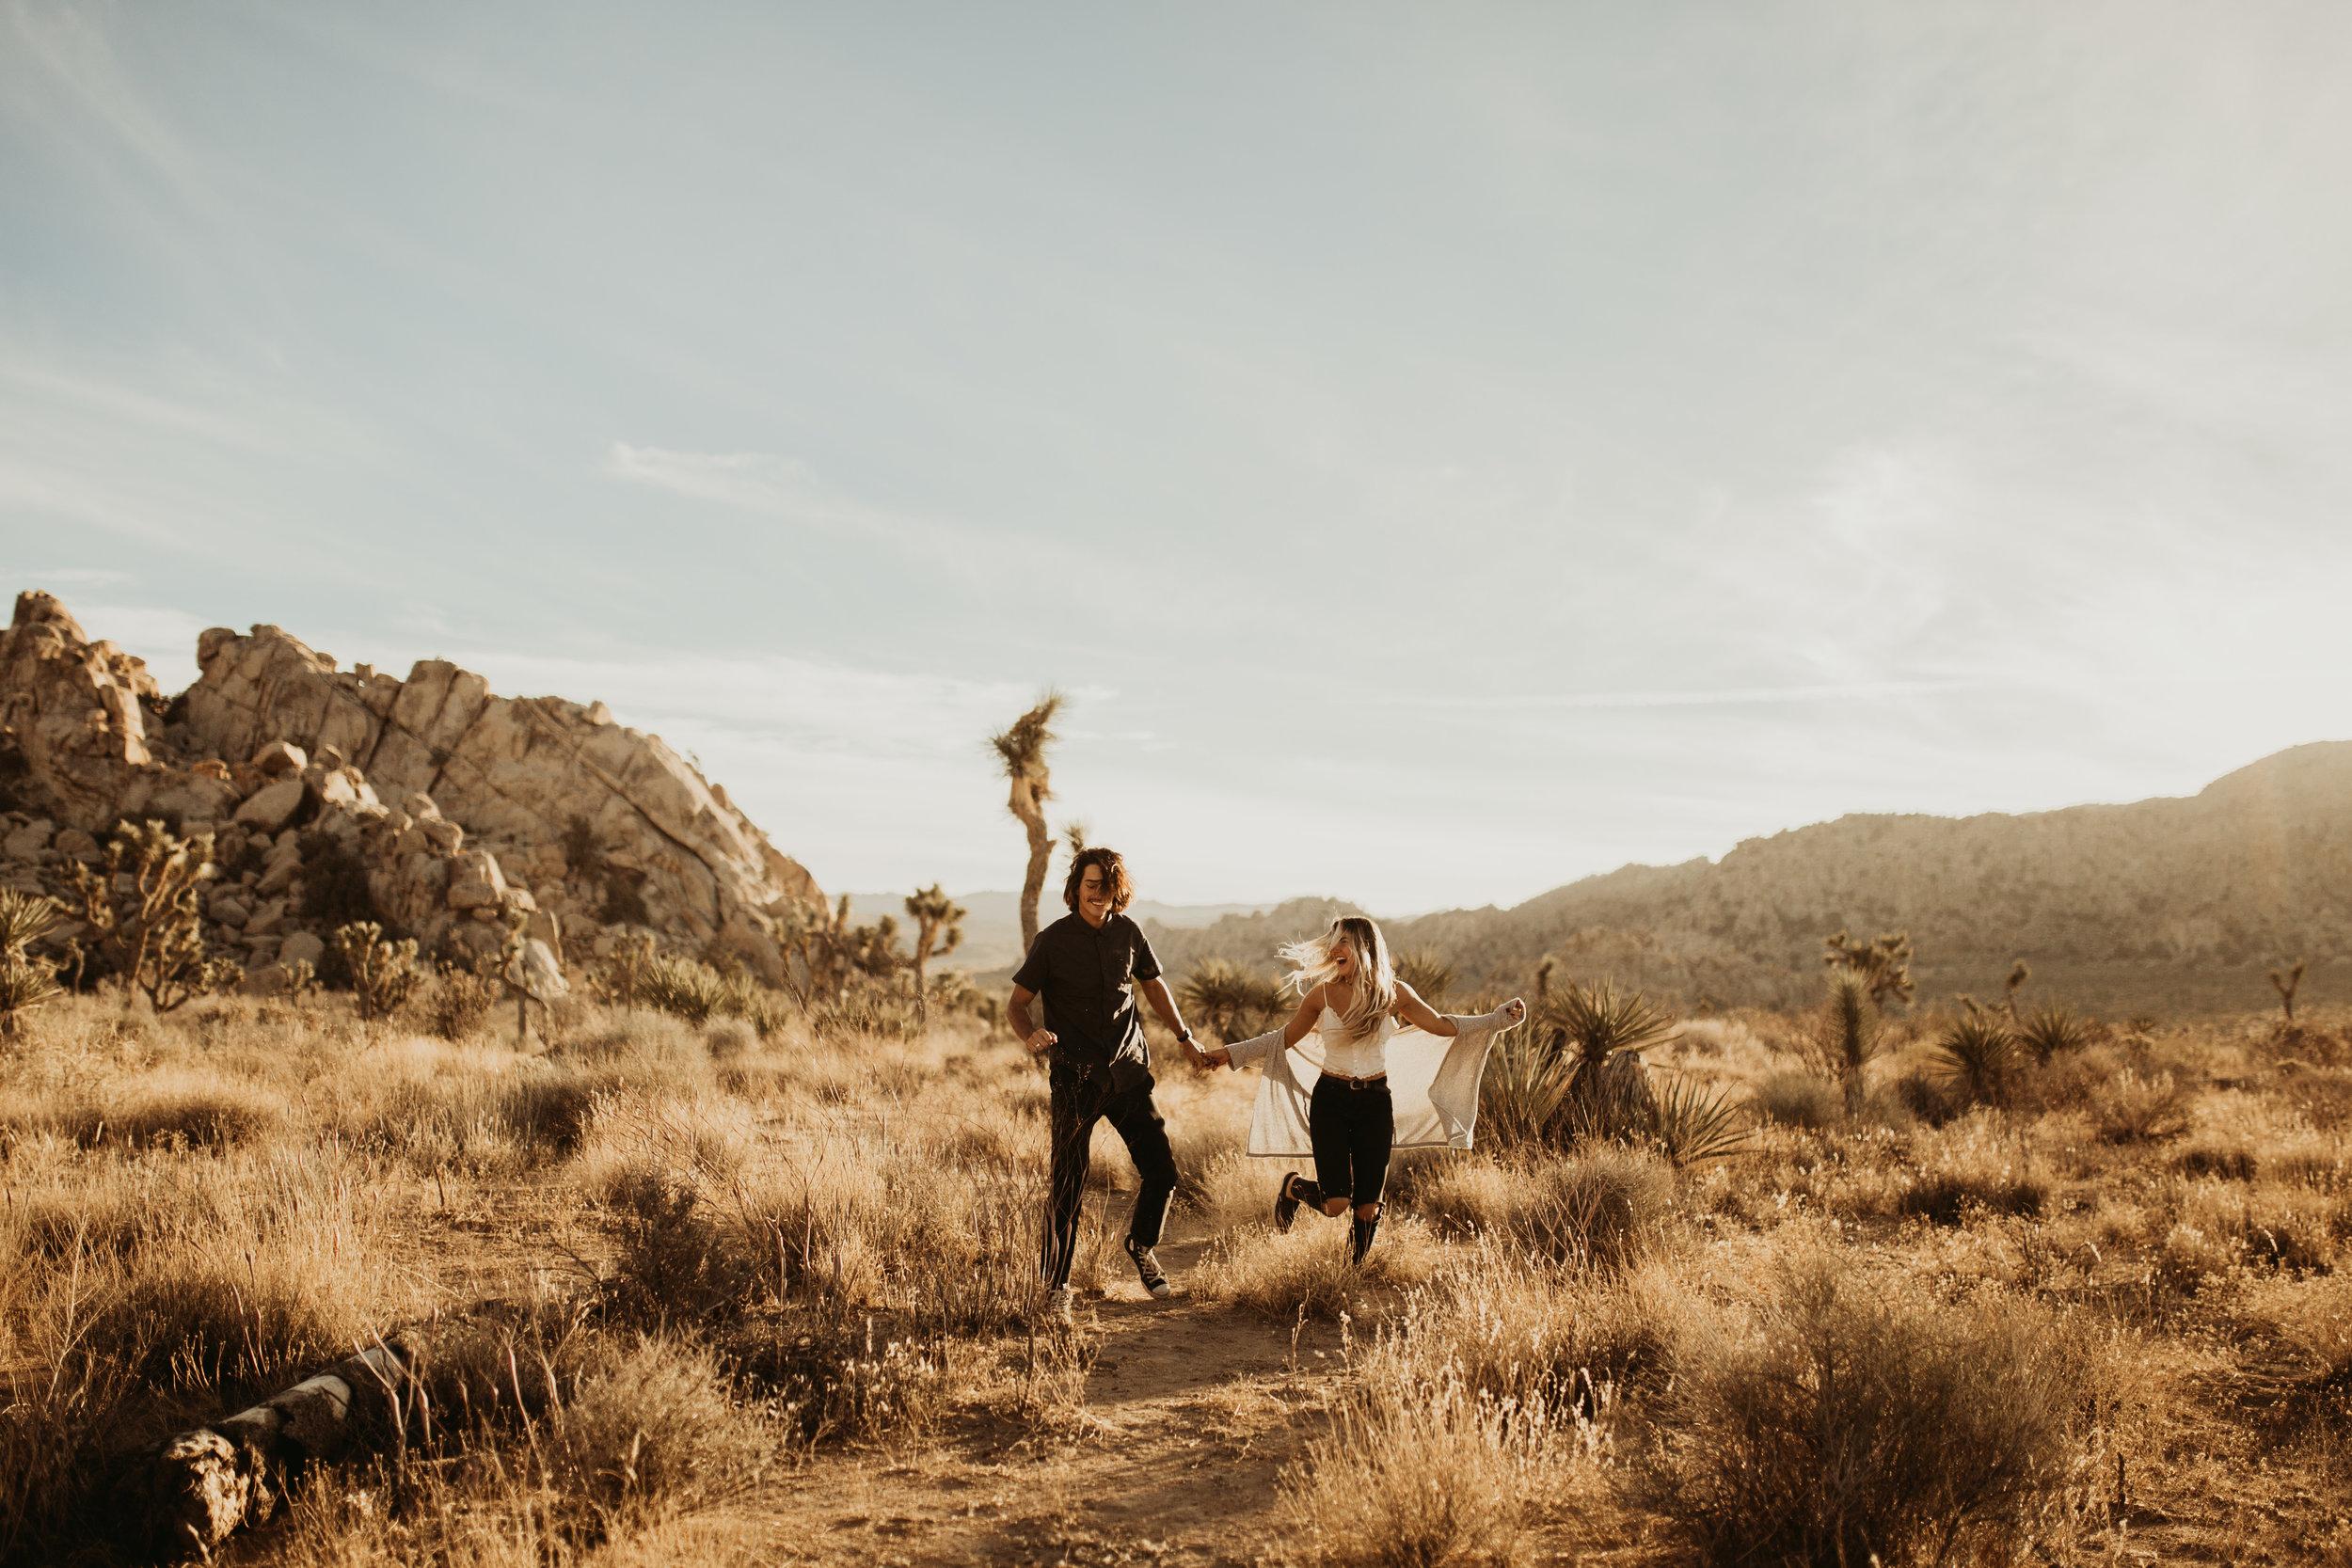 joshuatree+california+arizona+wedding+elopement+photographer24.jpg